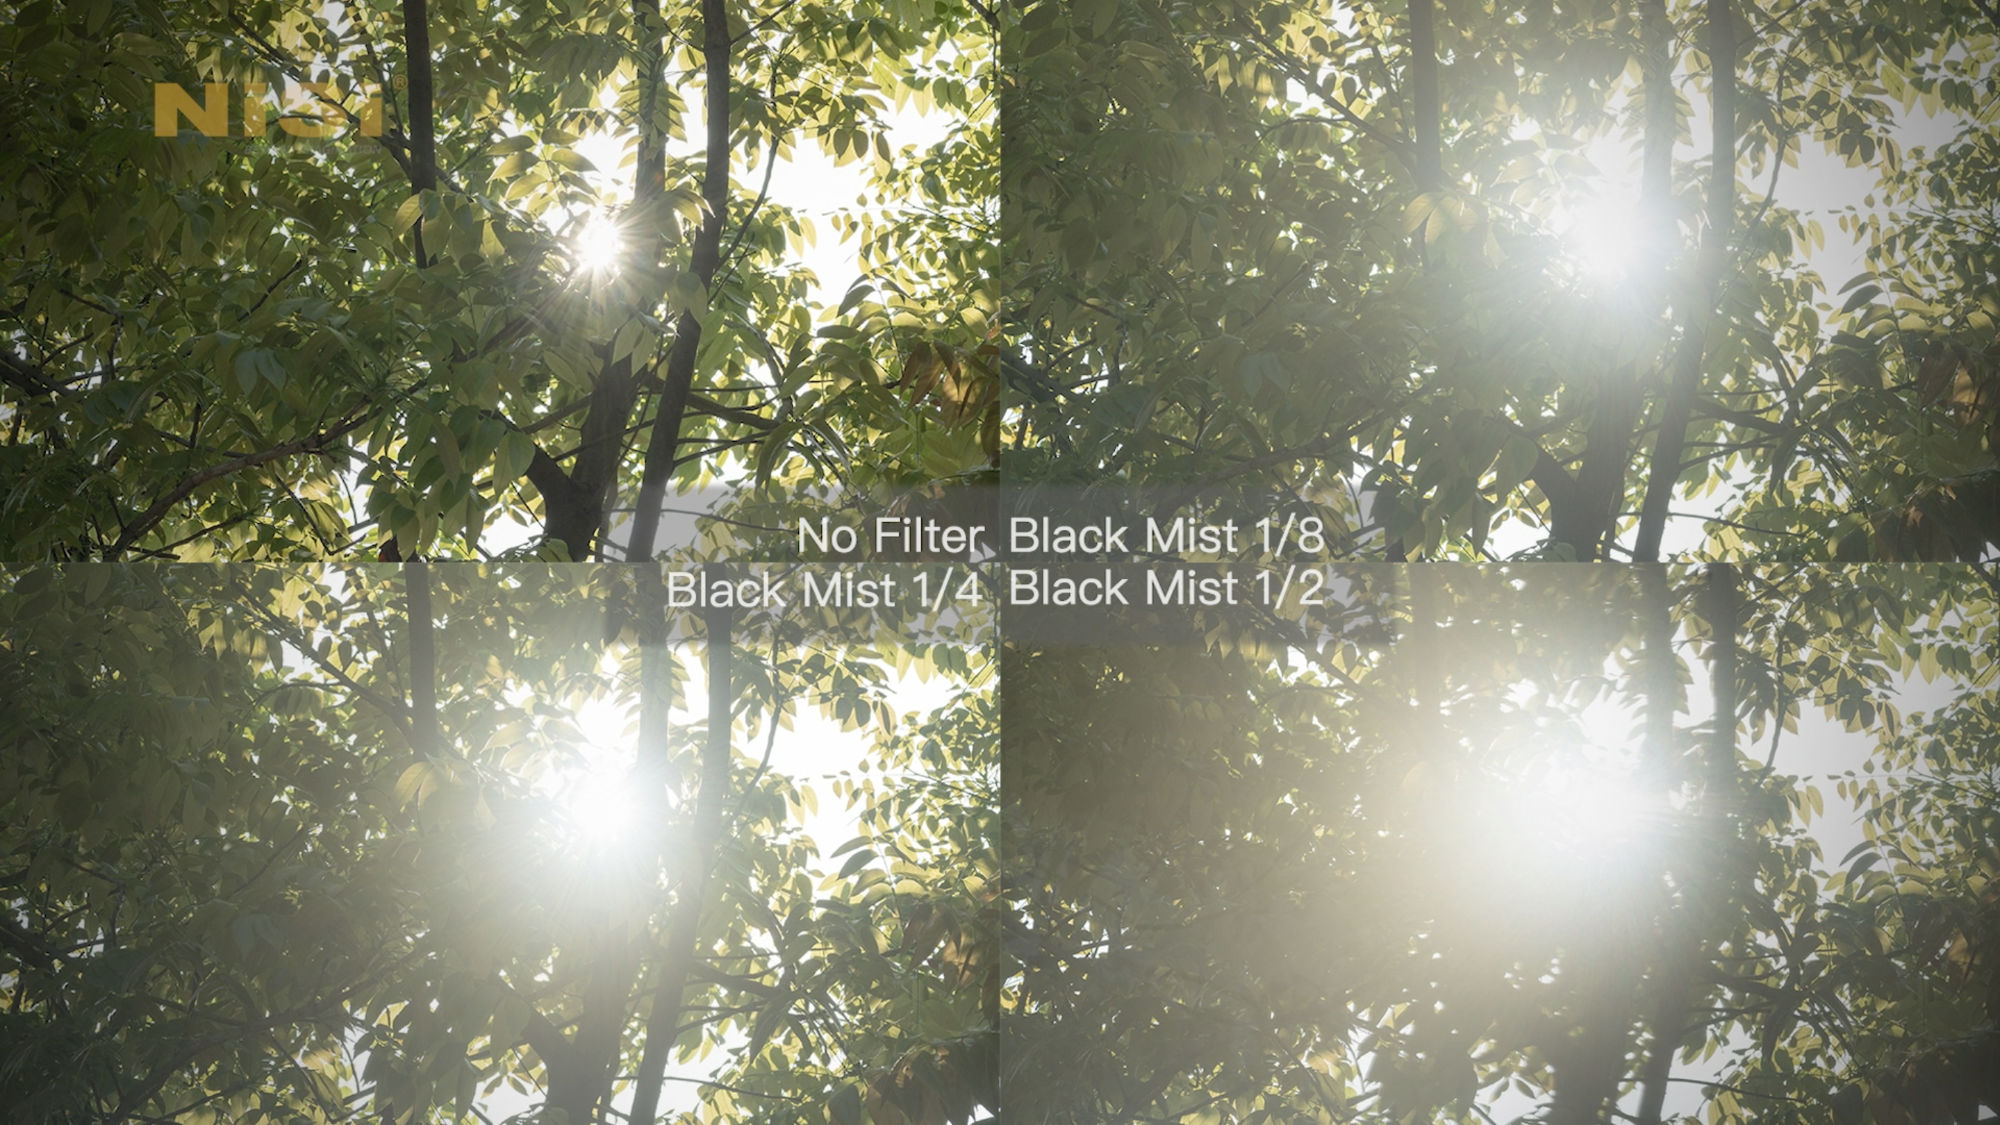 Black Mist Comparision 1